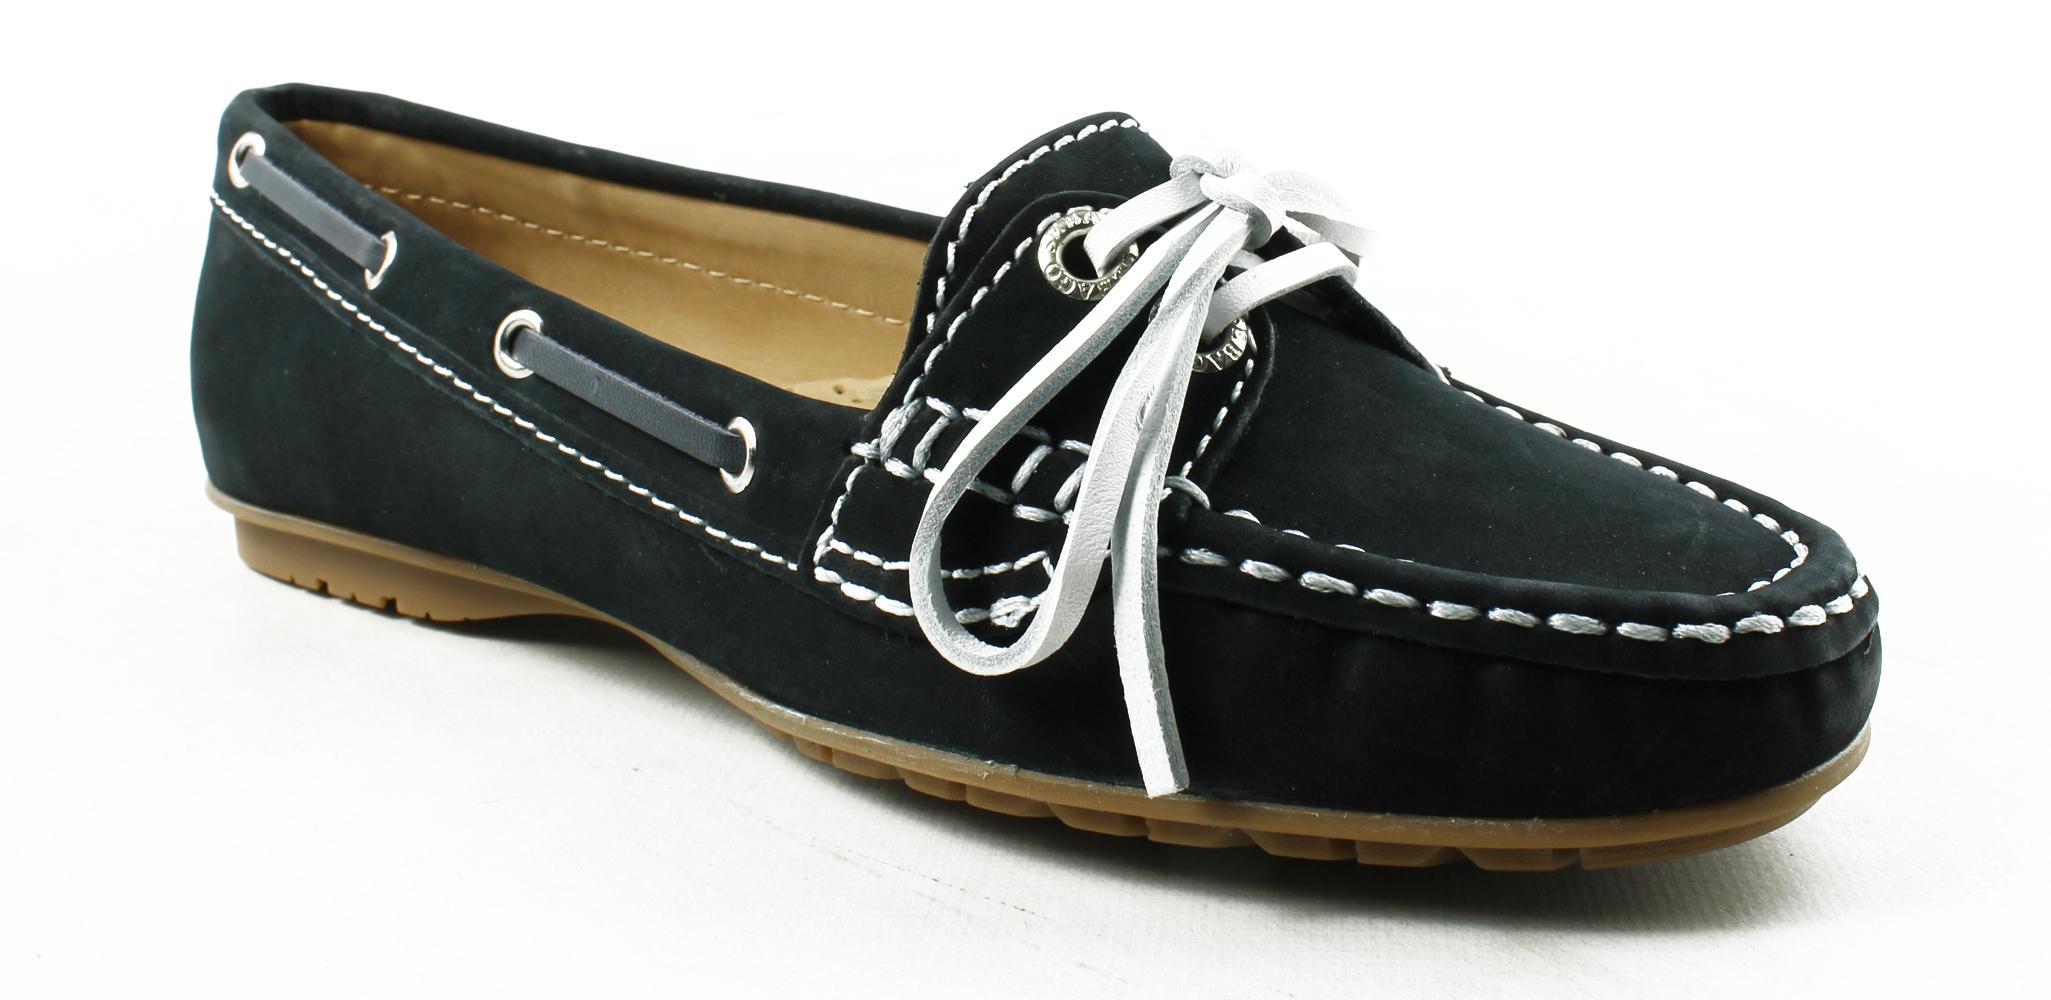 New Sebago Womens B409117-410 NavyNubuck Boat Shoes Size 5.5 by Sebago